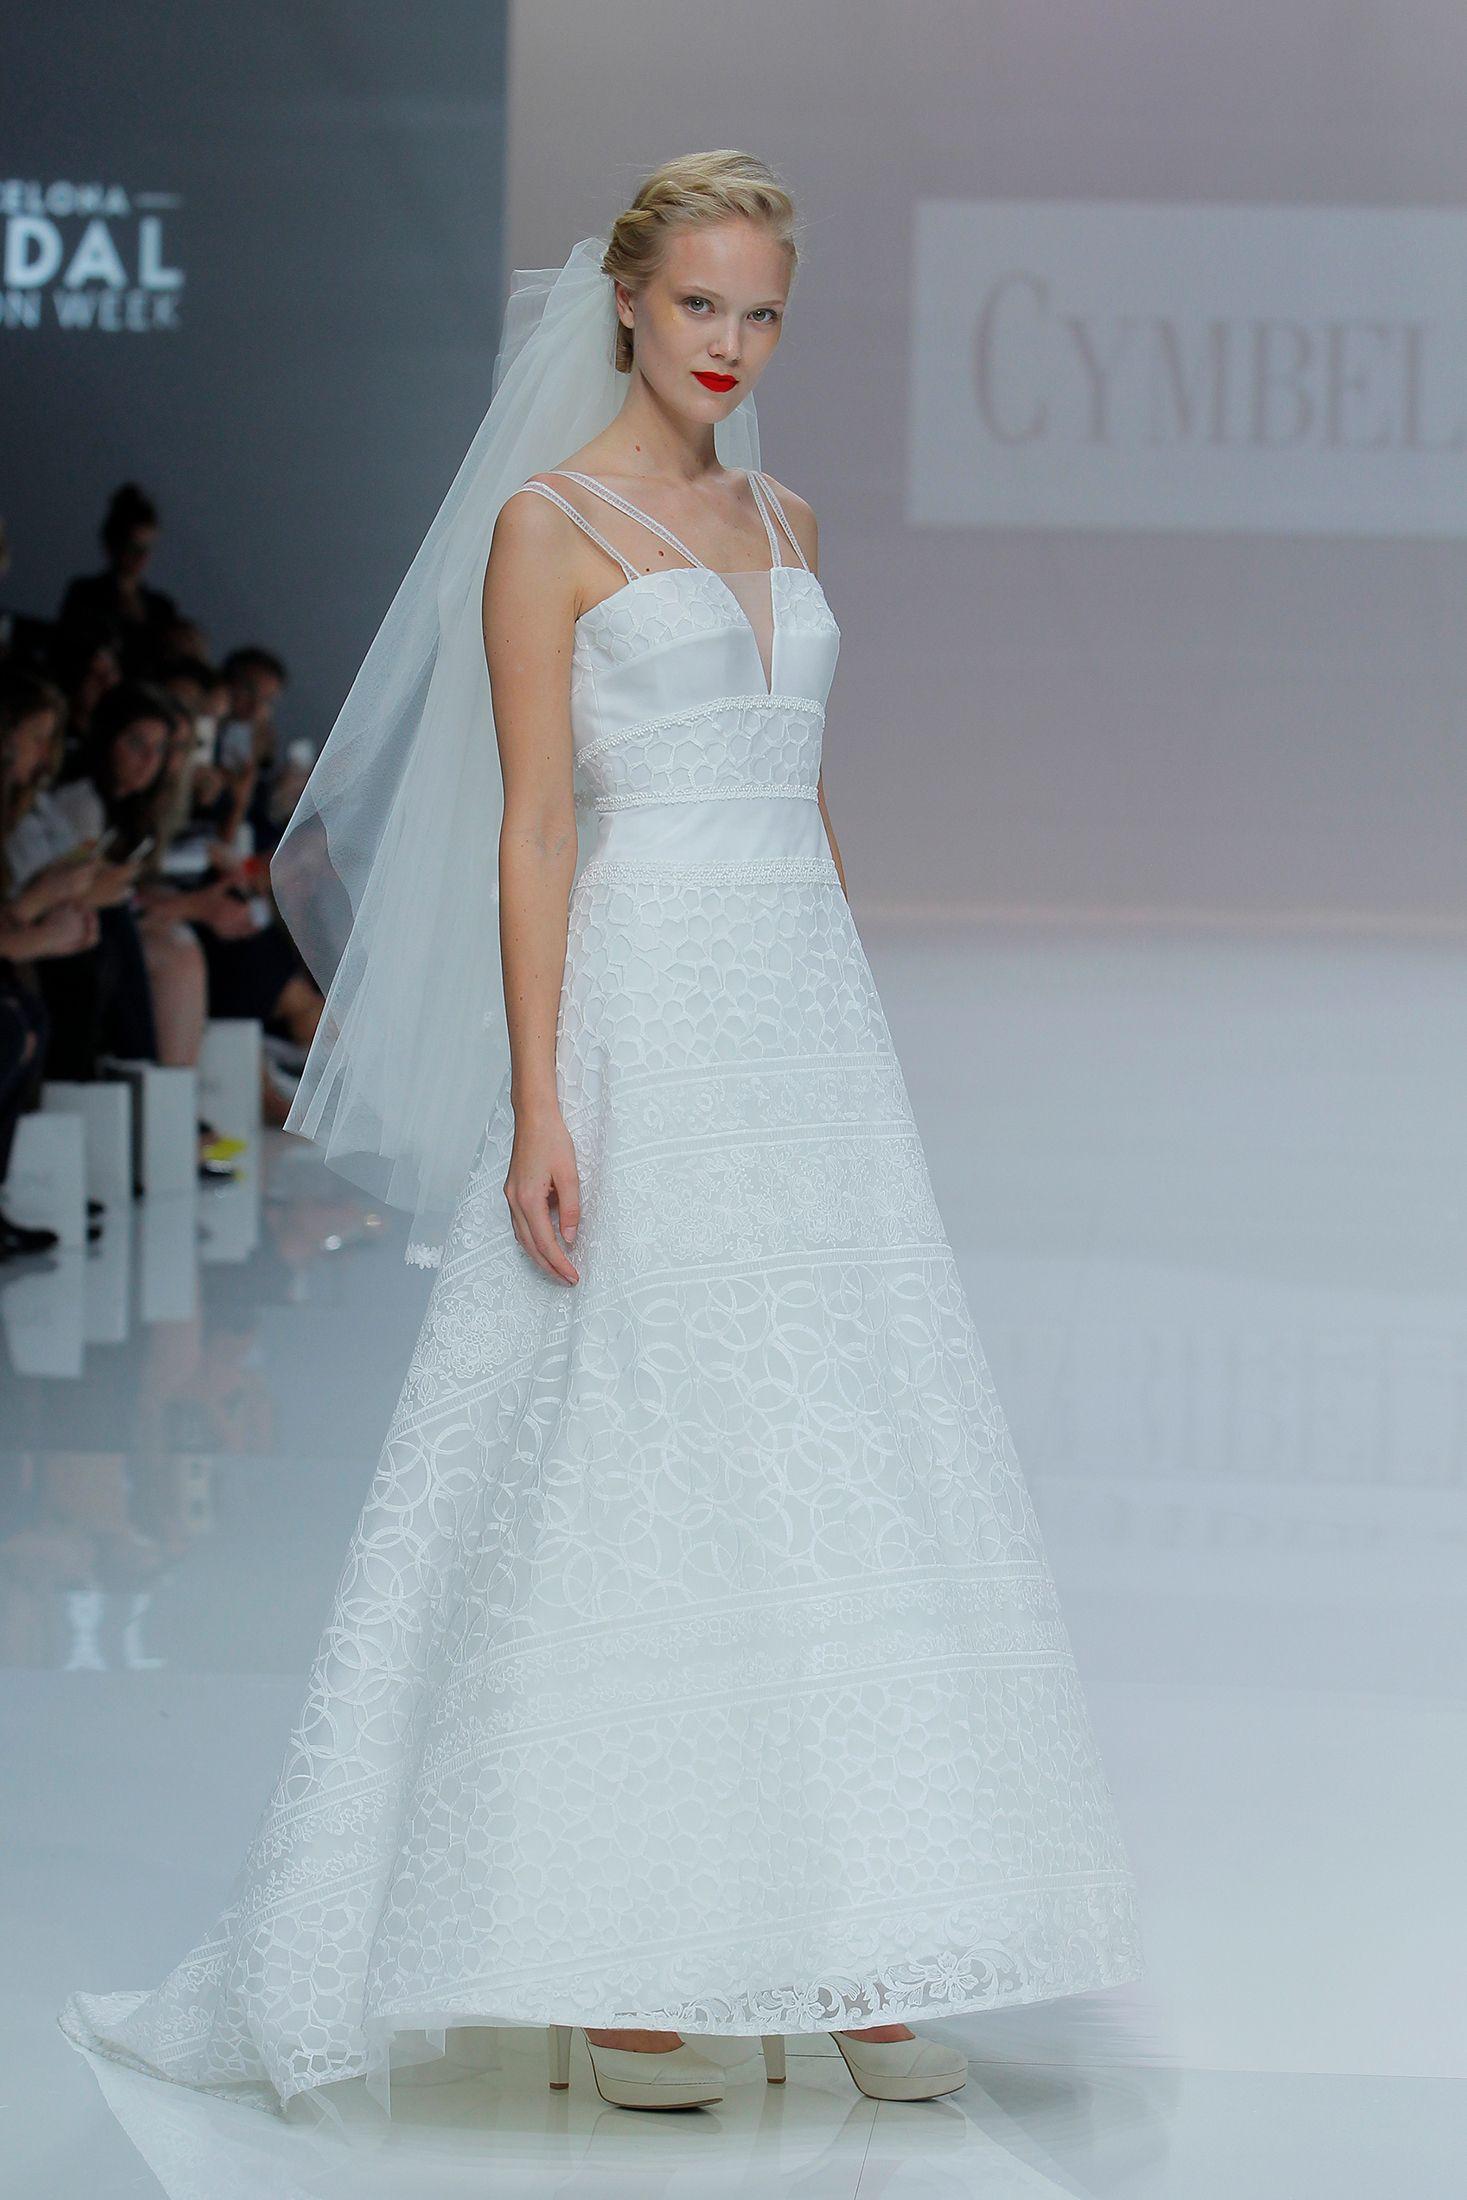 Vestido de Novia de Cymbeline - CY 074 #wedding #bodas #boda ...